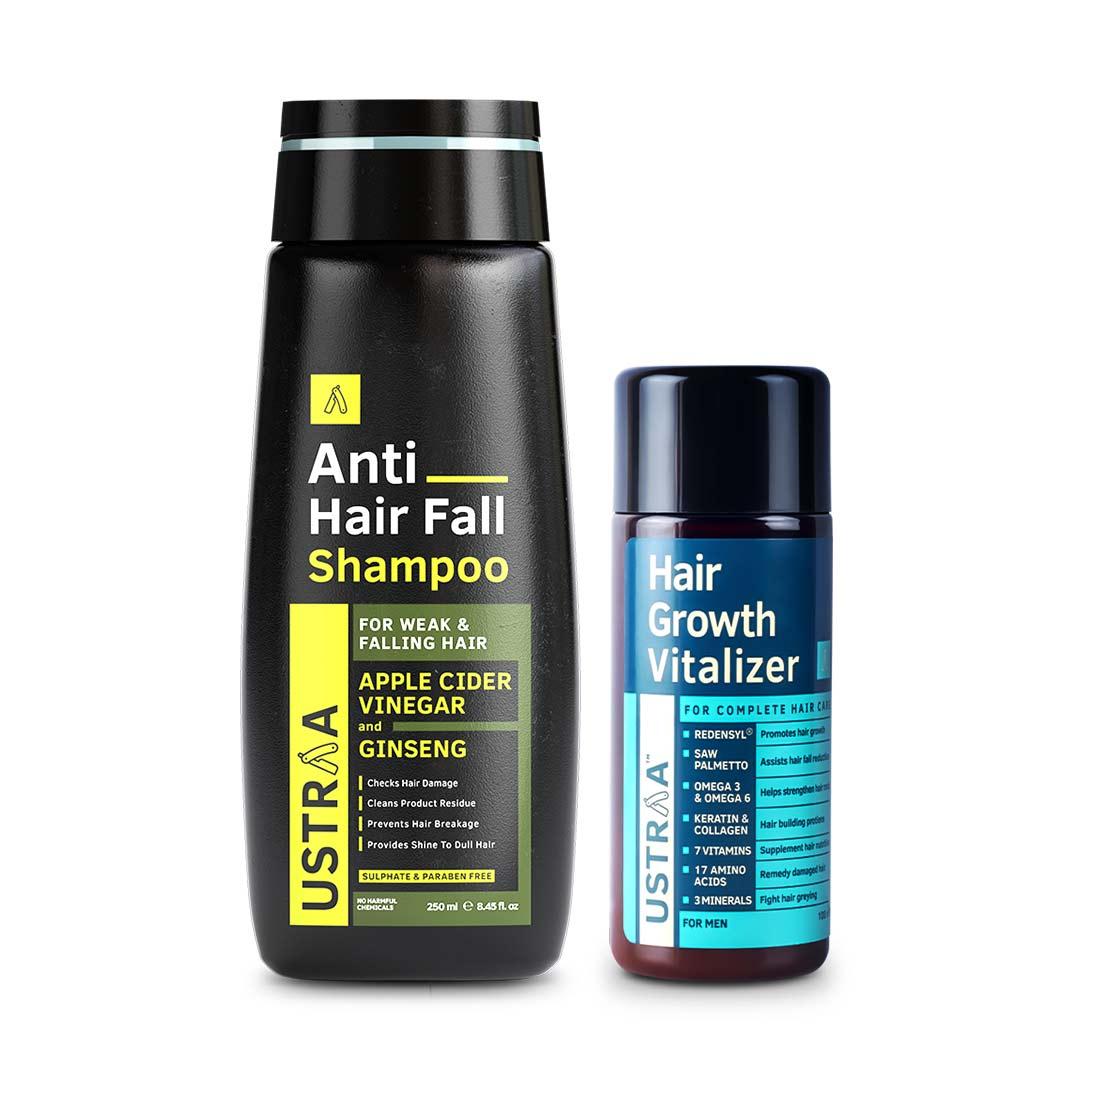 Ustraa | Ustraa Anti hair fall shampoo 250 ml & Hair Growth Vitalizer 100 ml